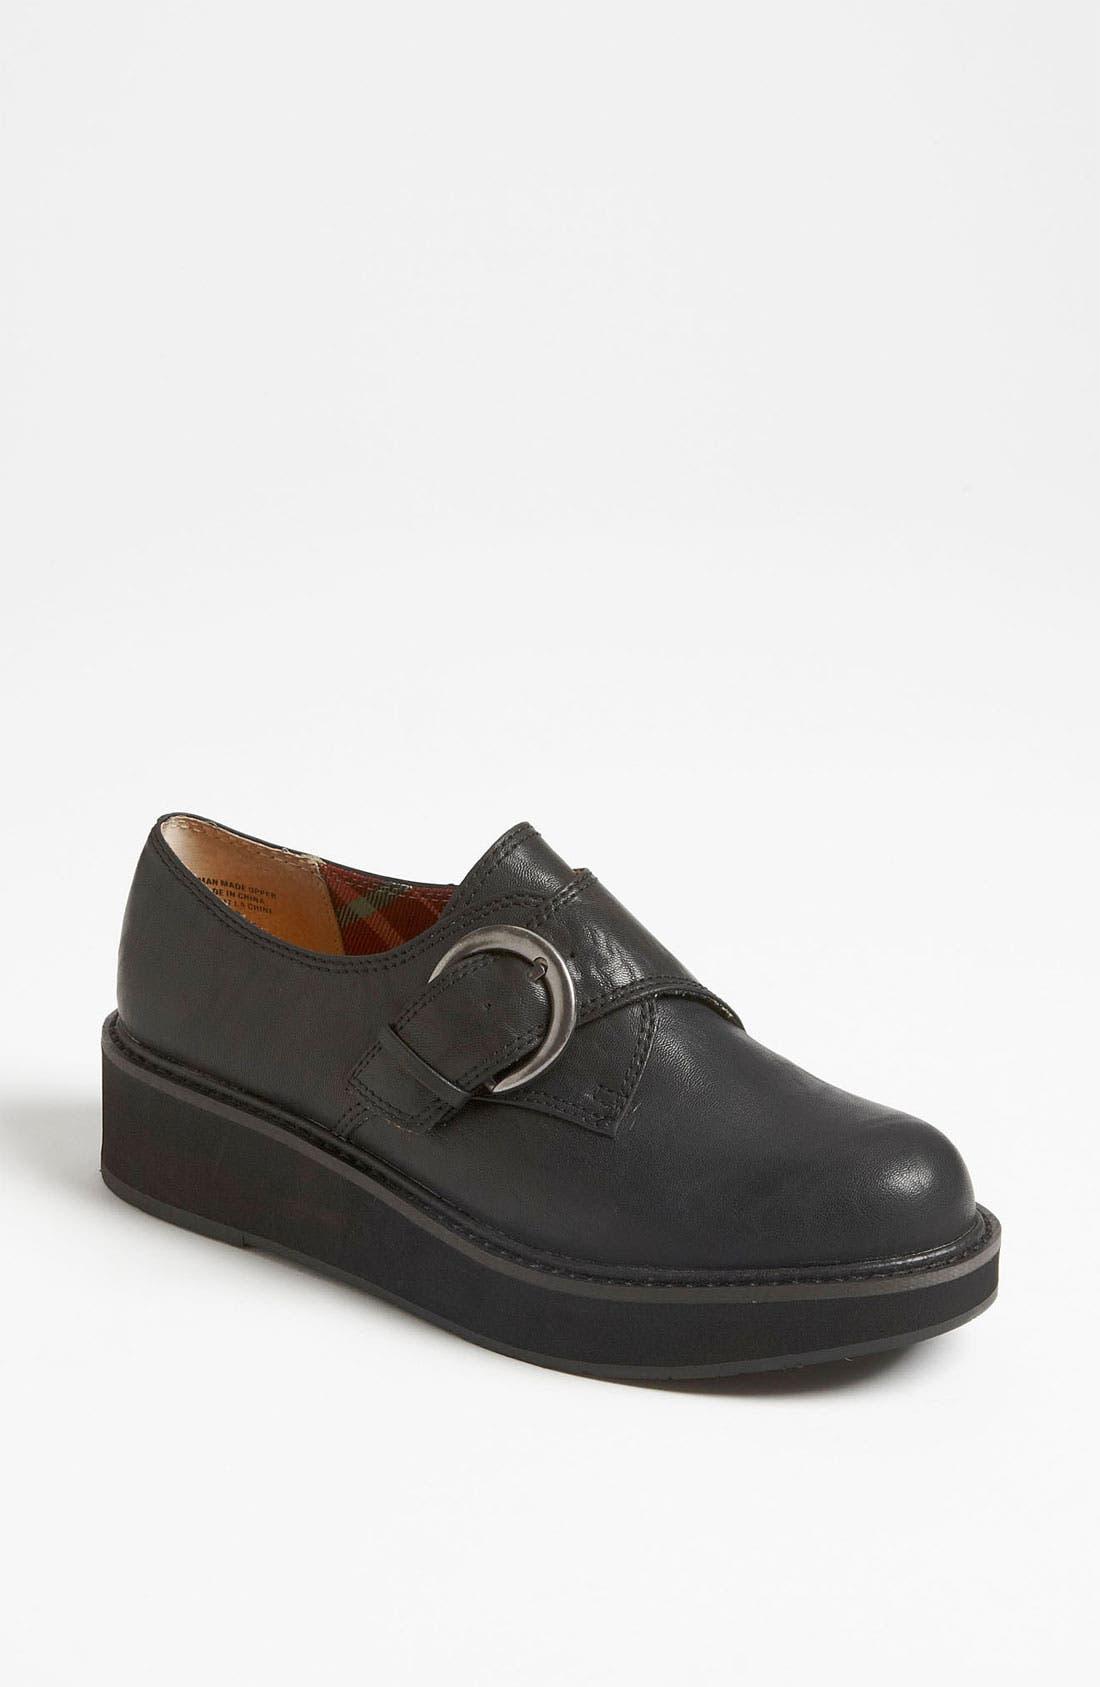 Main Image - BC Footwear 'Higher Education' Flat